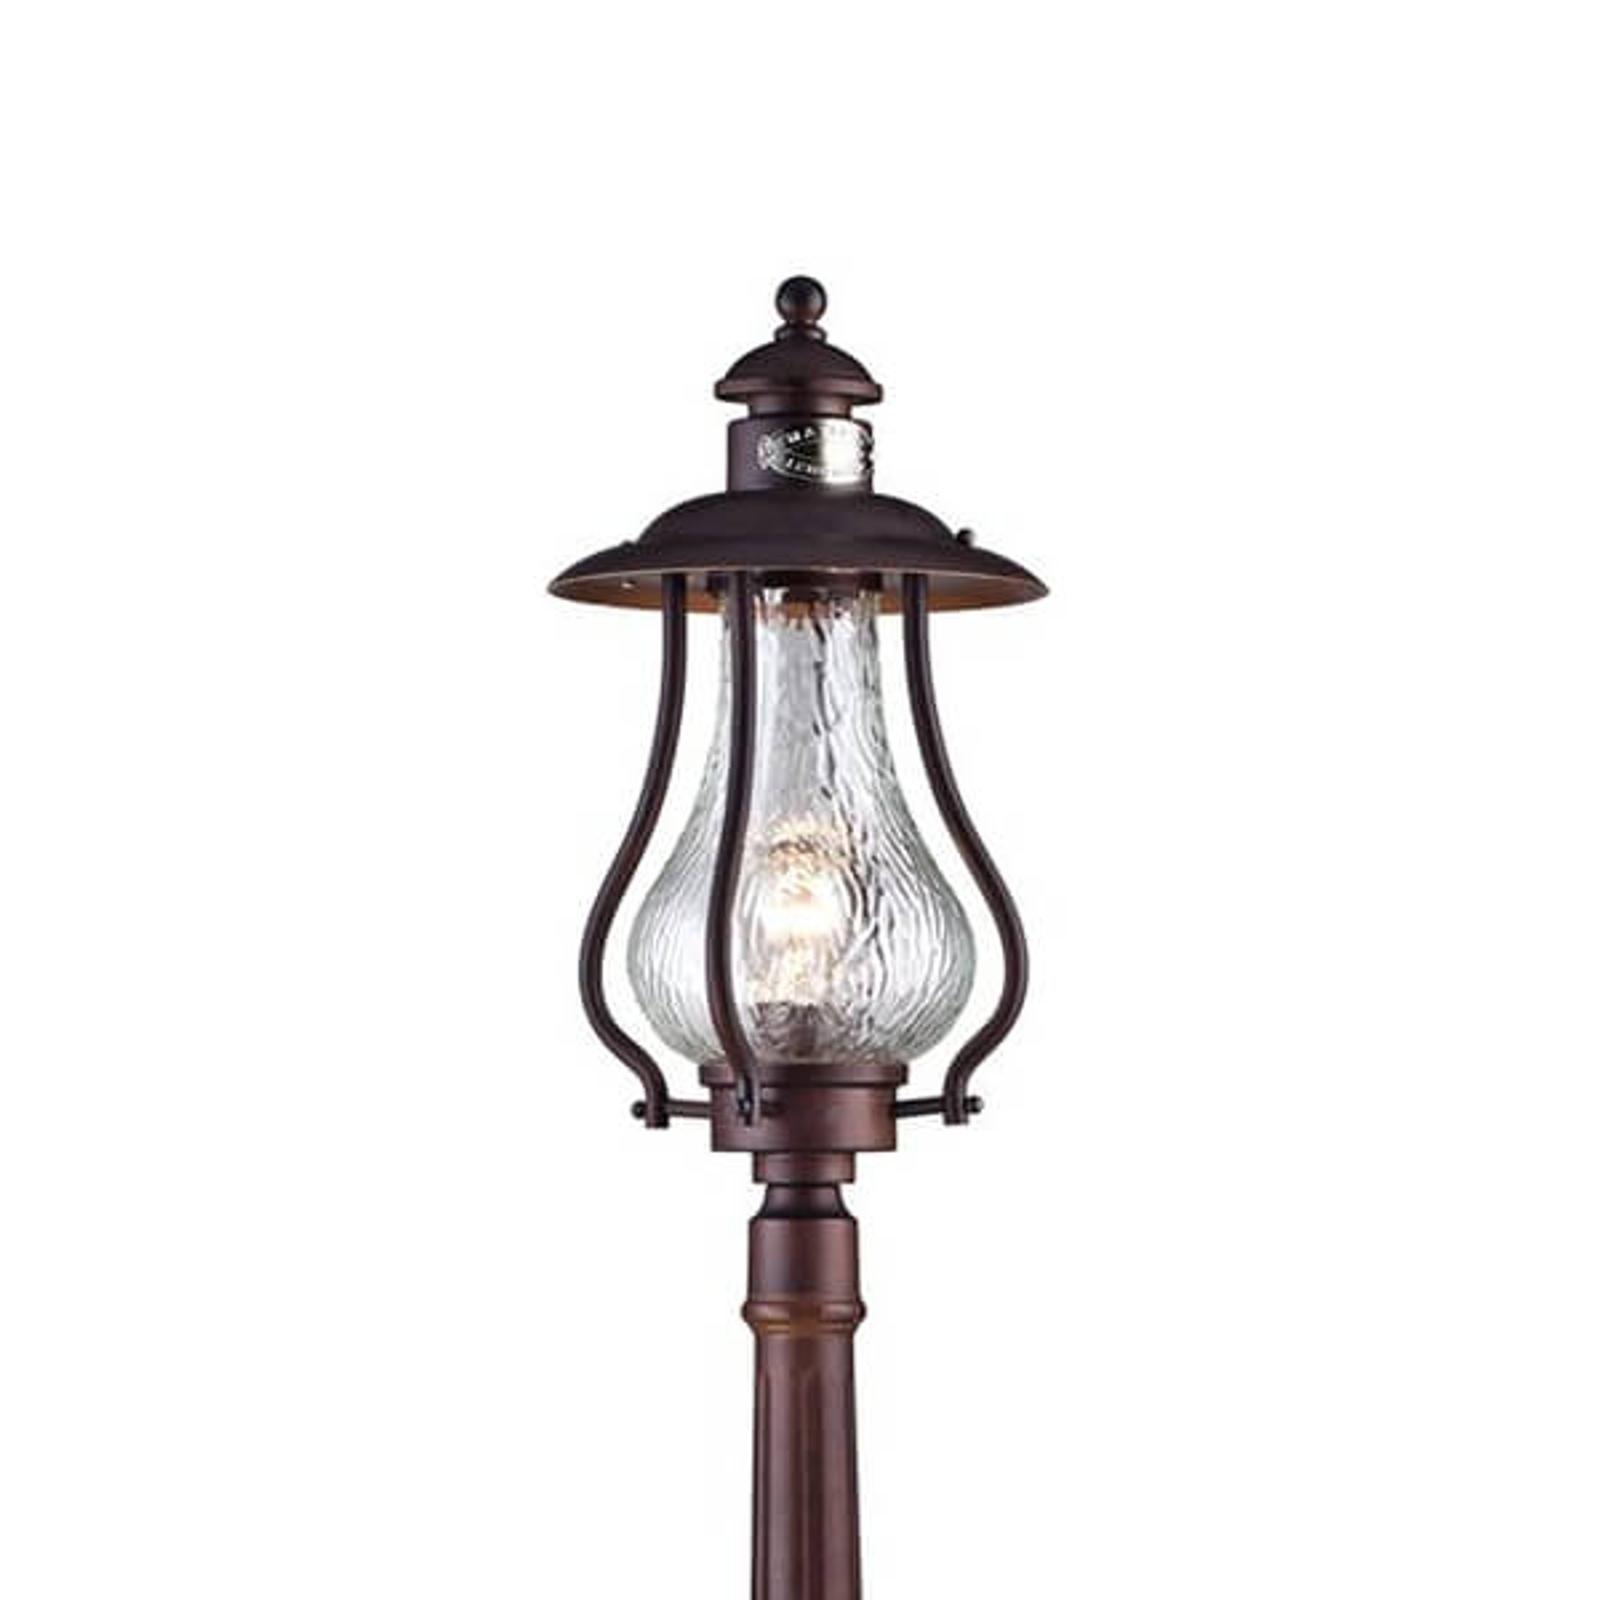 Dekorativt utformet veilampe La Rambla